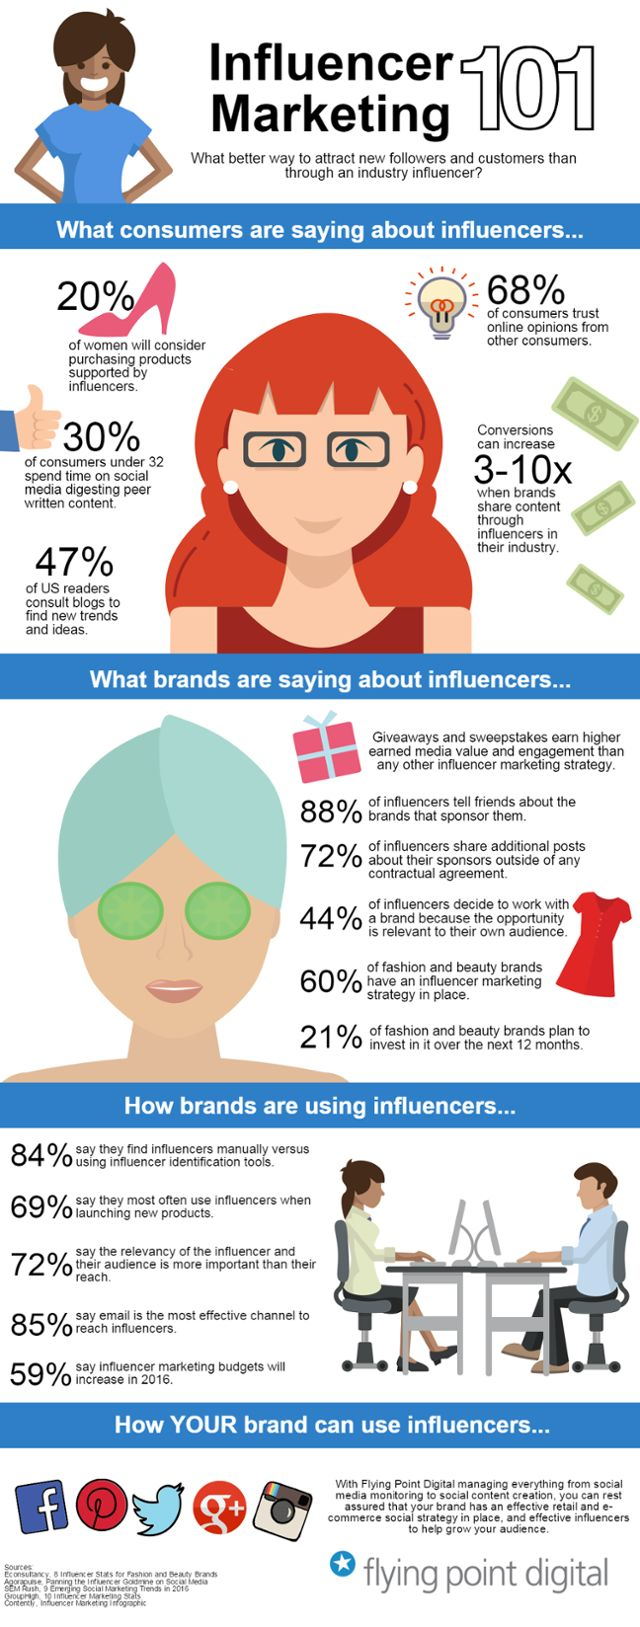 digital-marketing-infographics-9-influencer-marketing.png